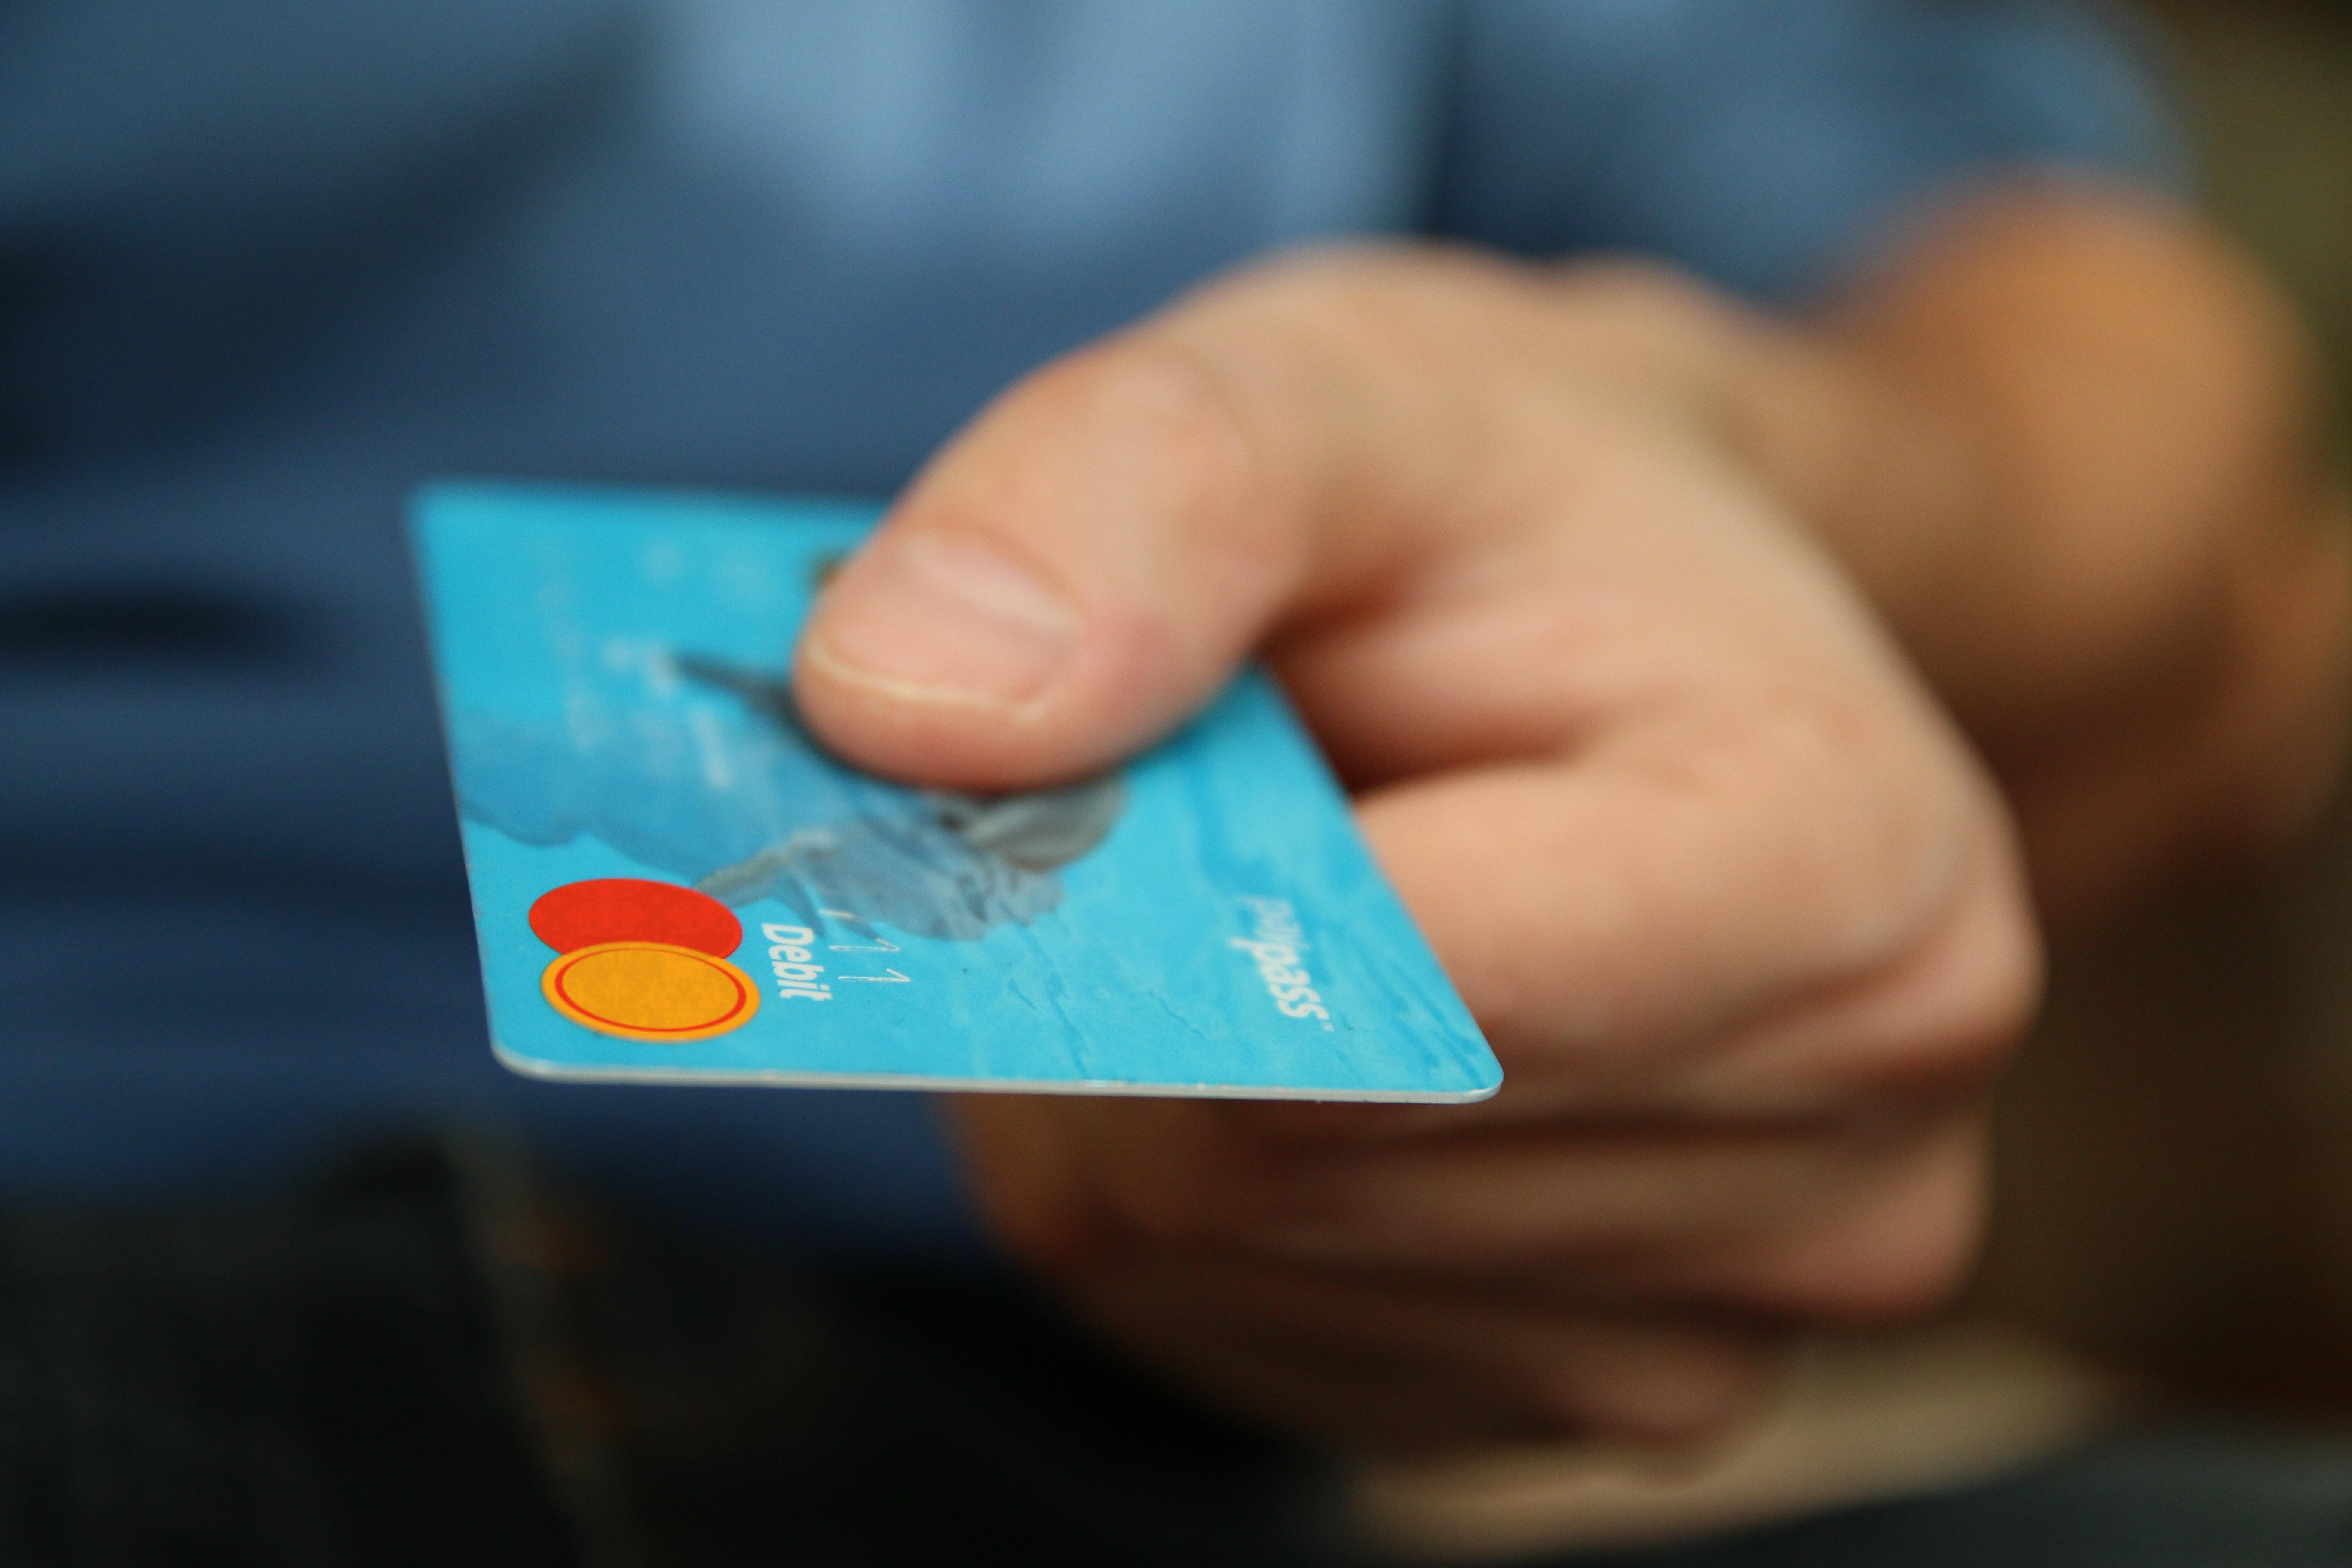 importancia-de-online-payment-para-pymes-flexio-2